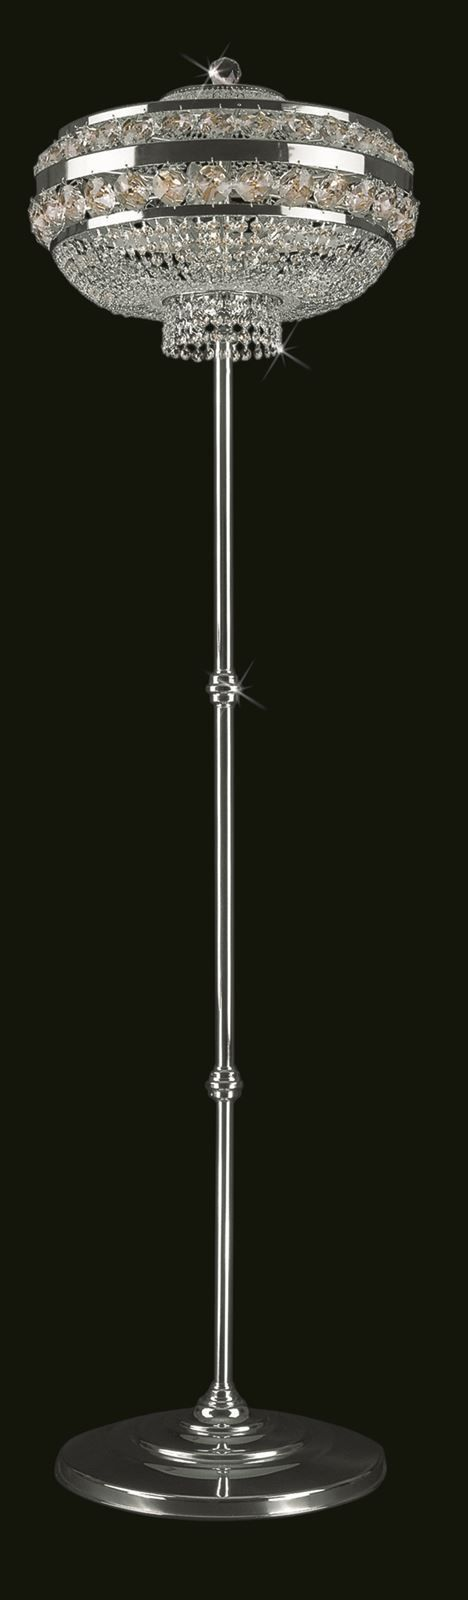 #Bordura #TimelessHeritageCatalogue #Chandelier #Lamp #LightingDesign #Trimmings